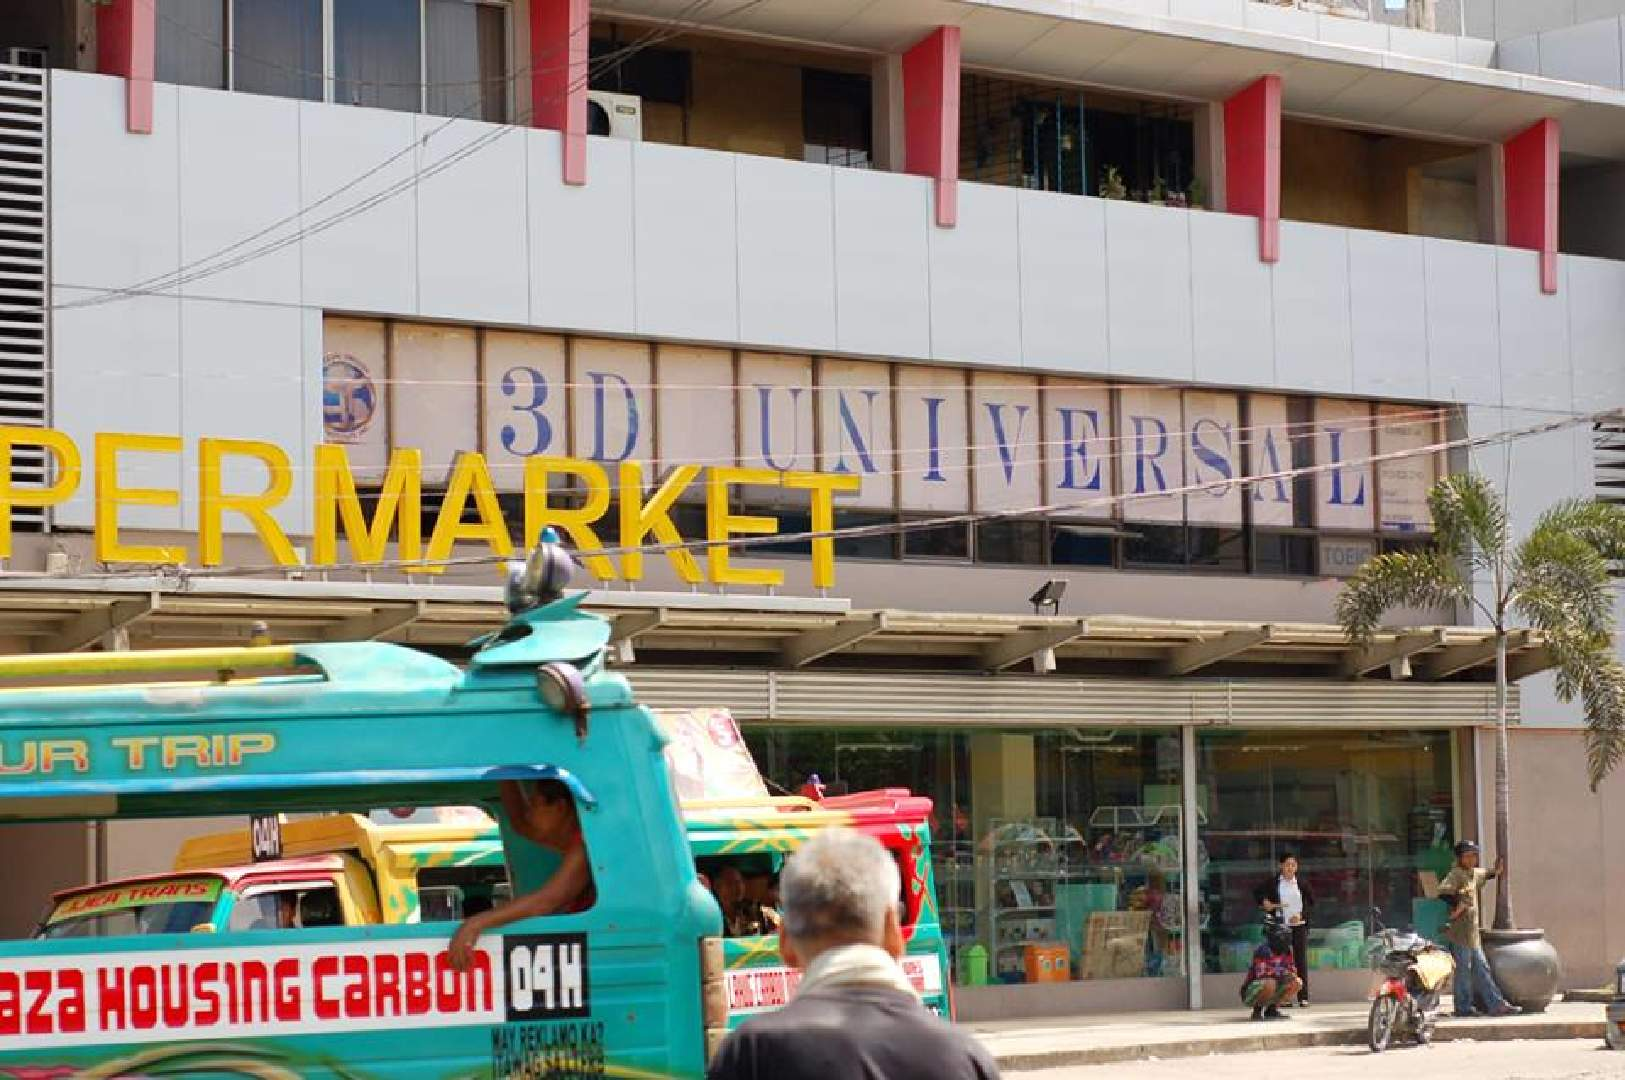 3D Universal Academy (Cebu City, Philippines) - Reviews